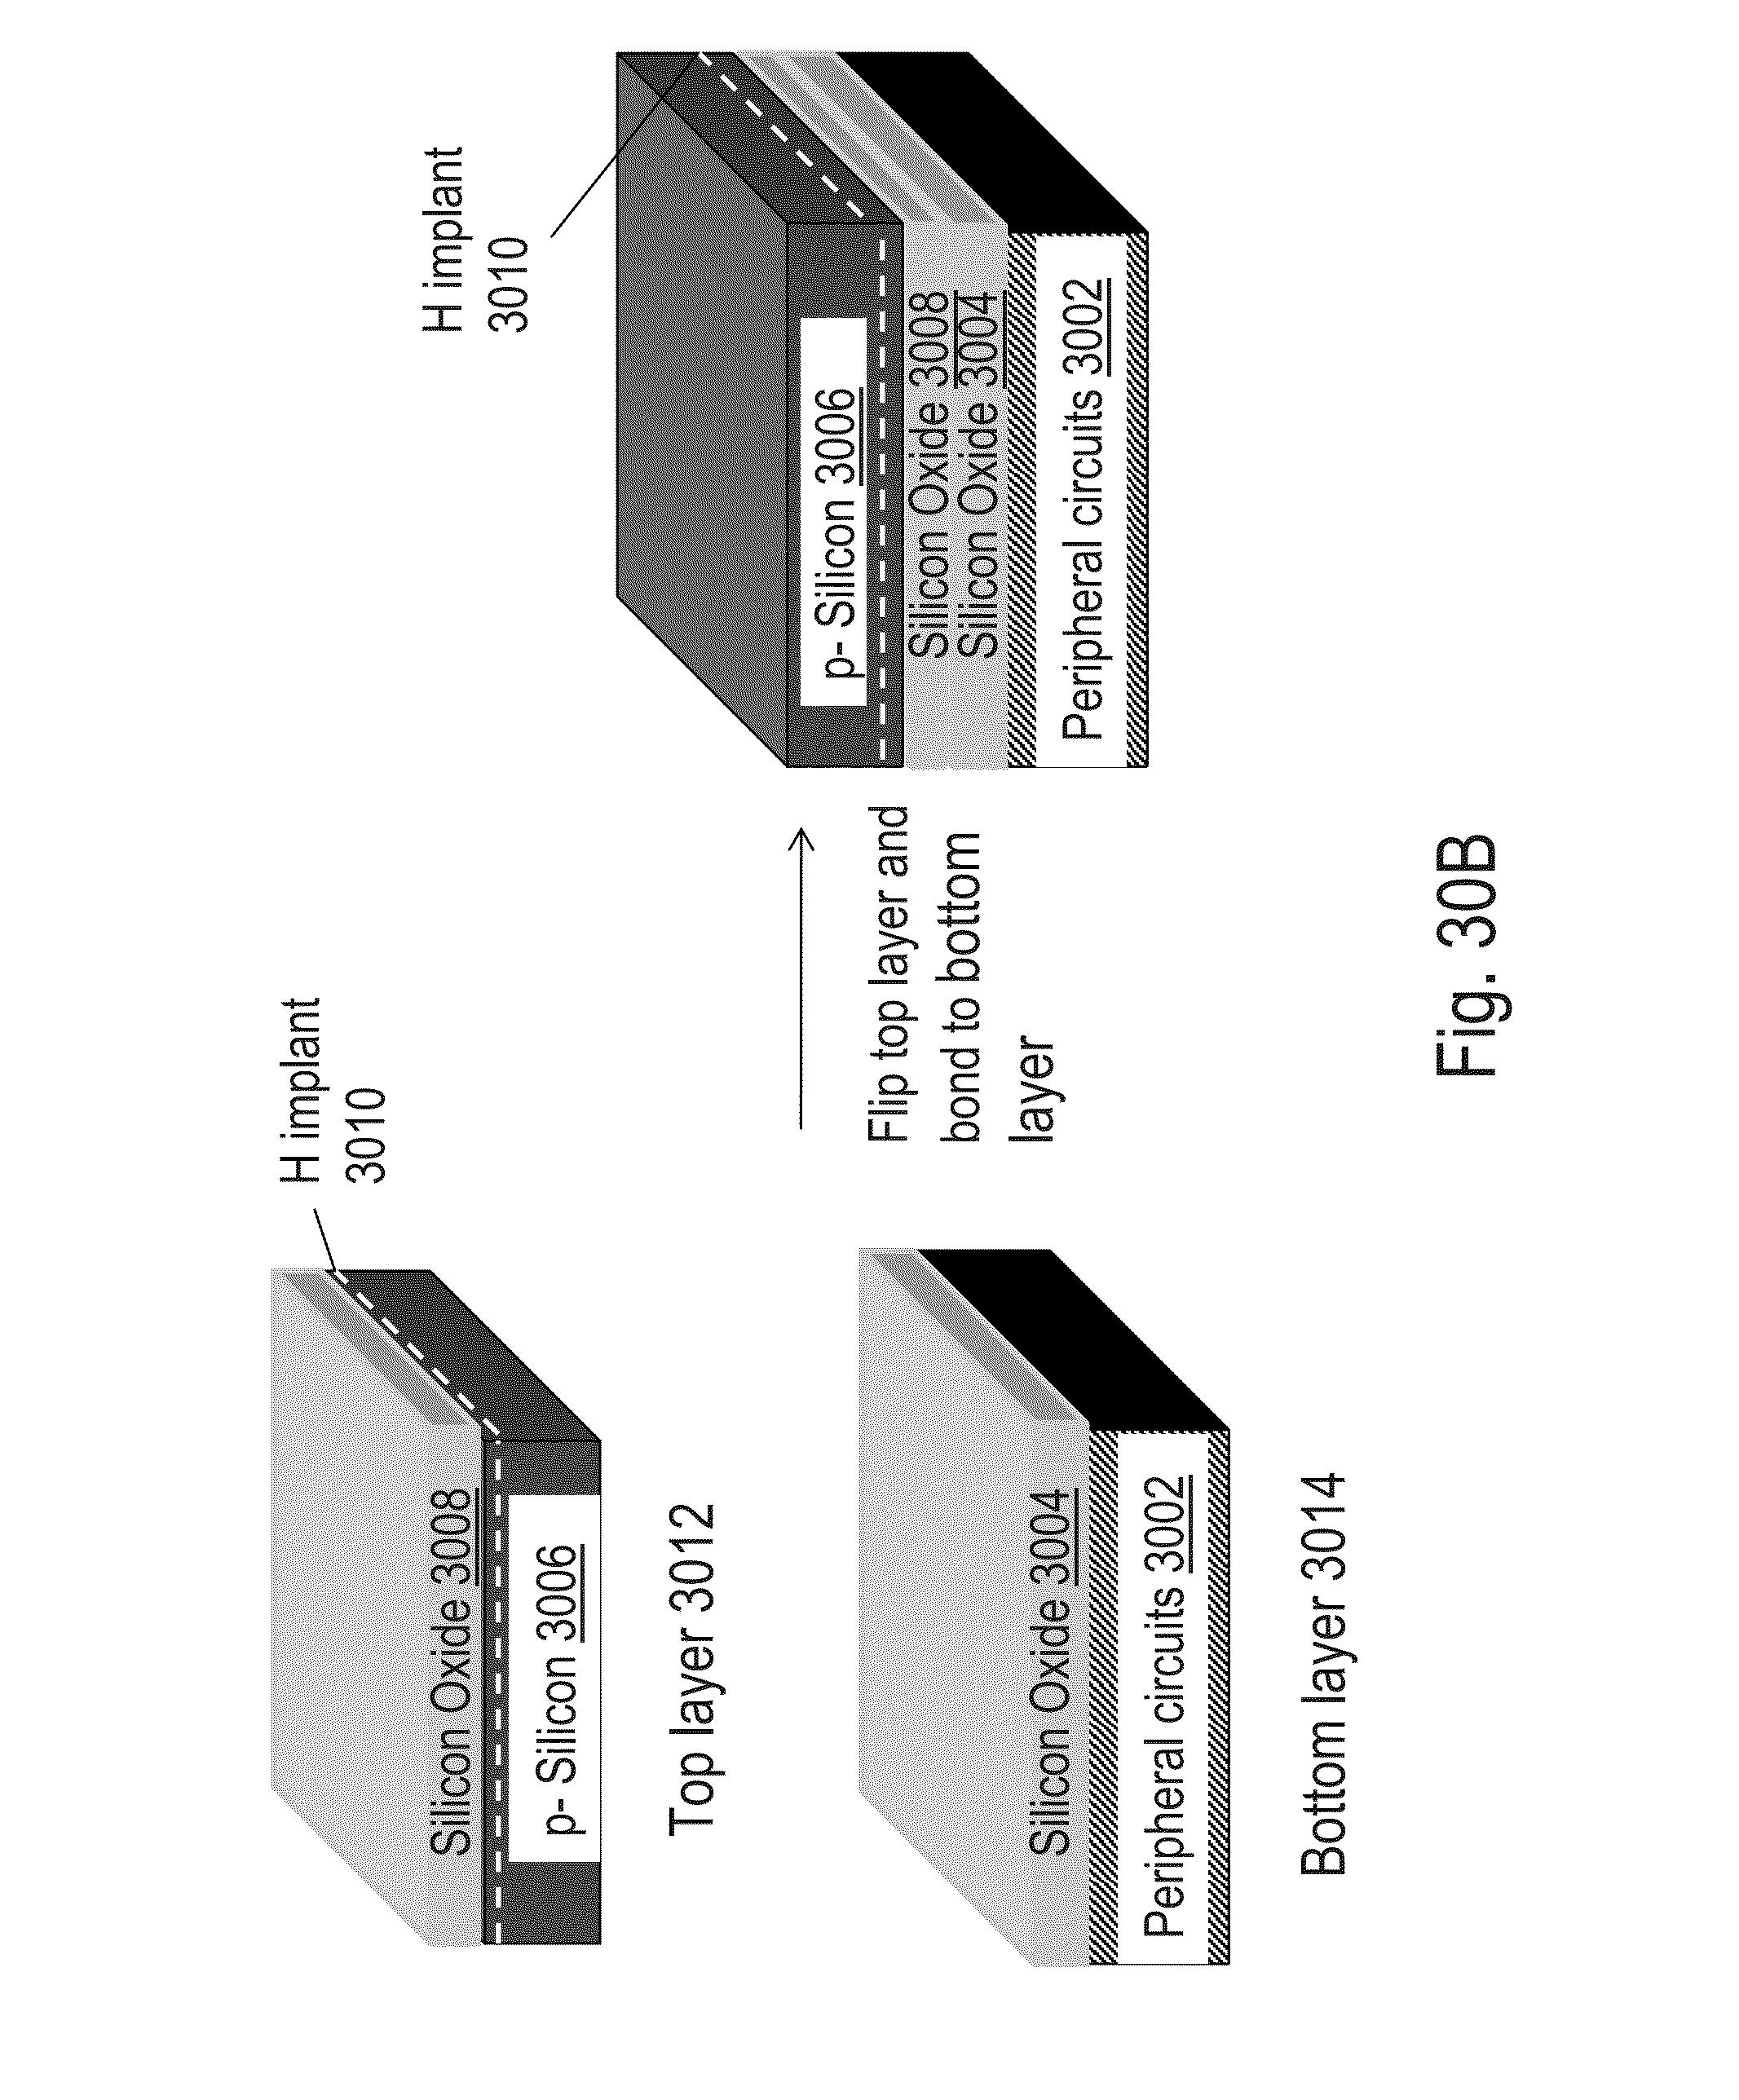 Patent US 8,642,416 B2